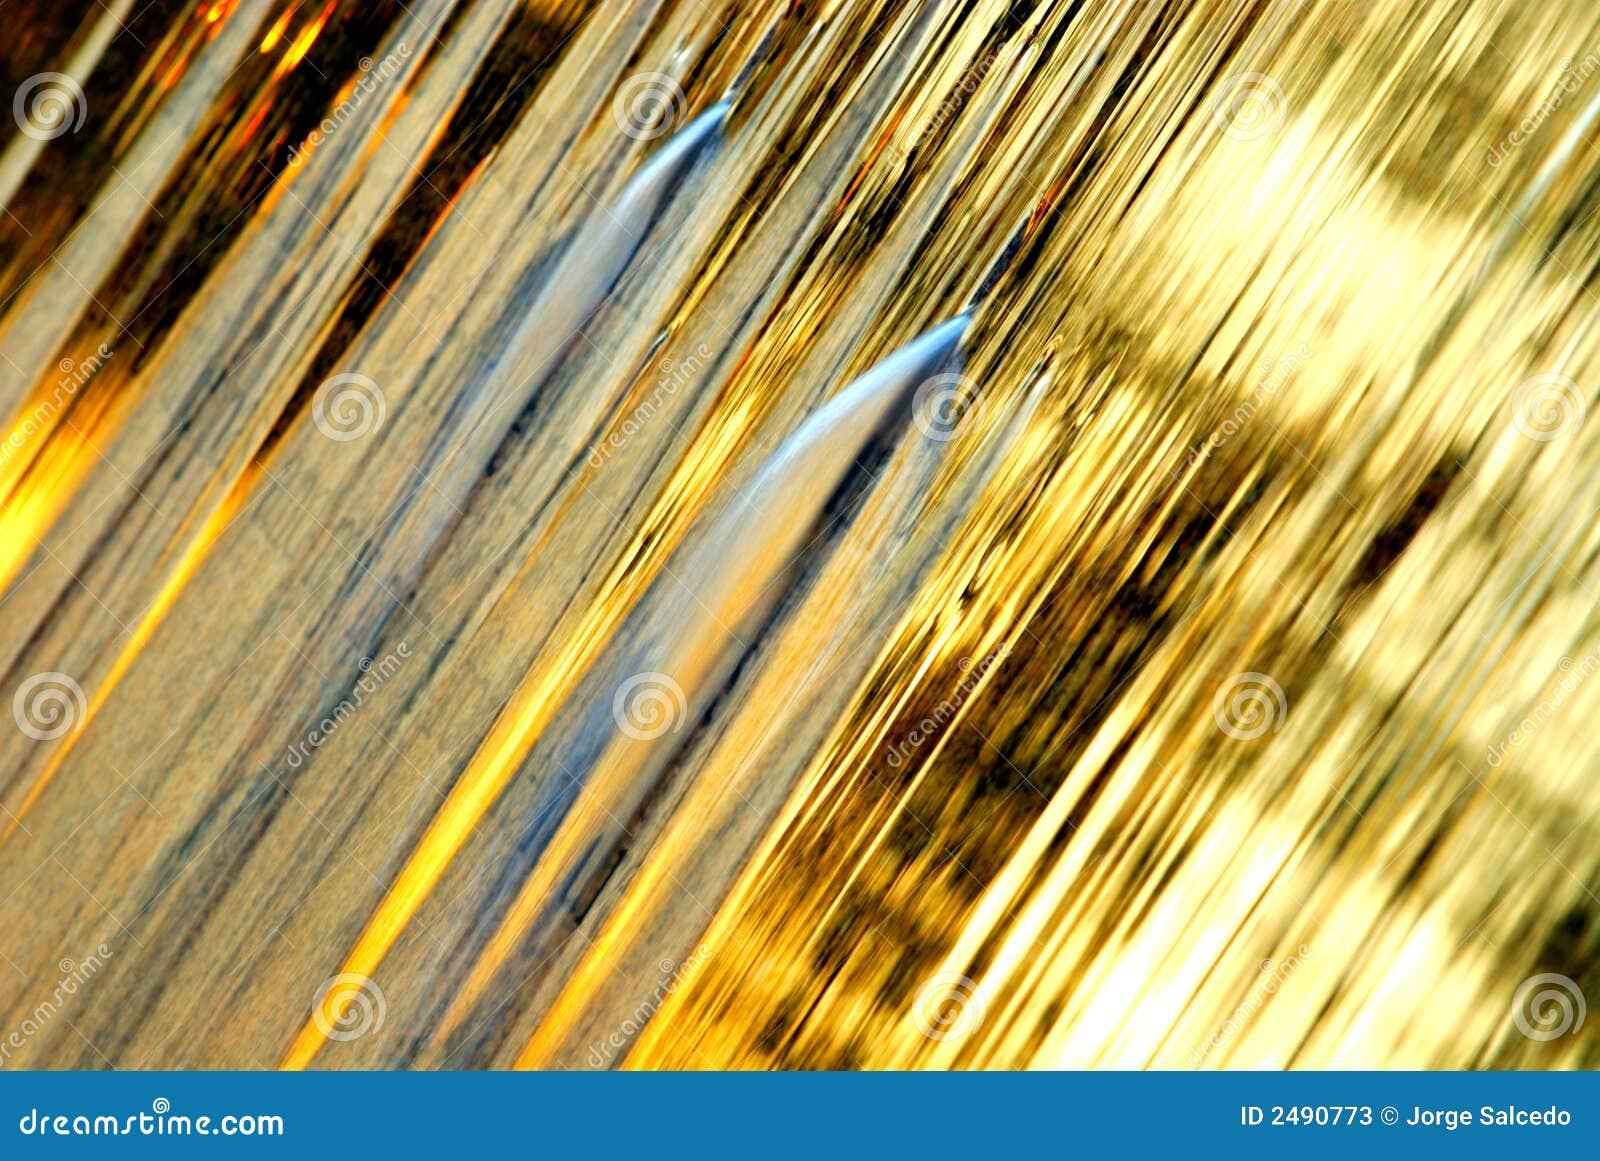 Fundo dourado do volume de água